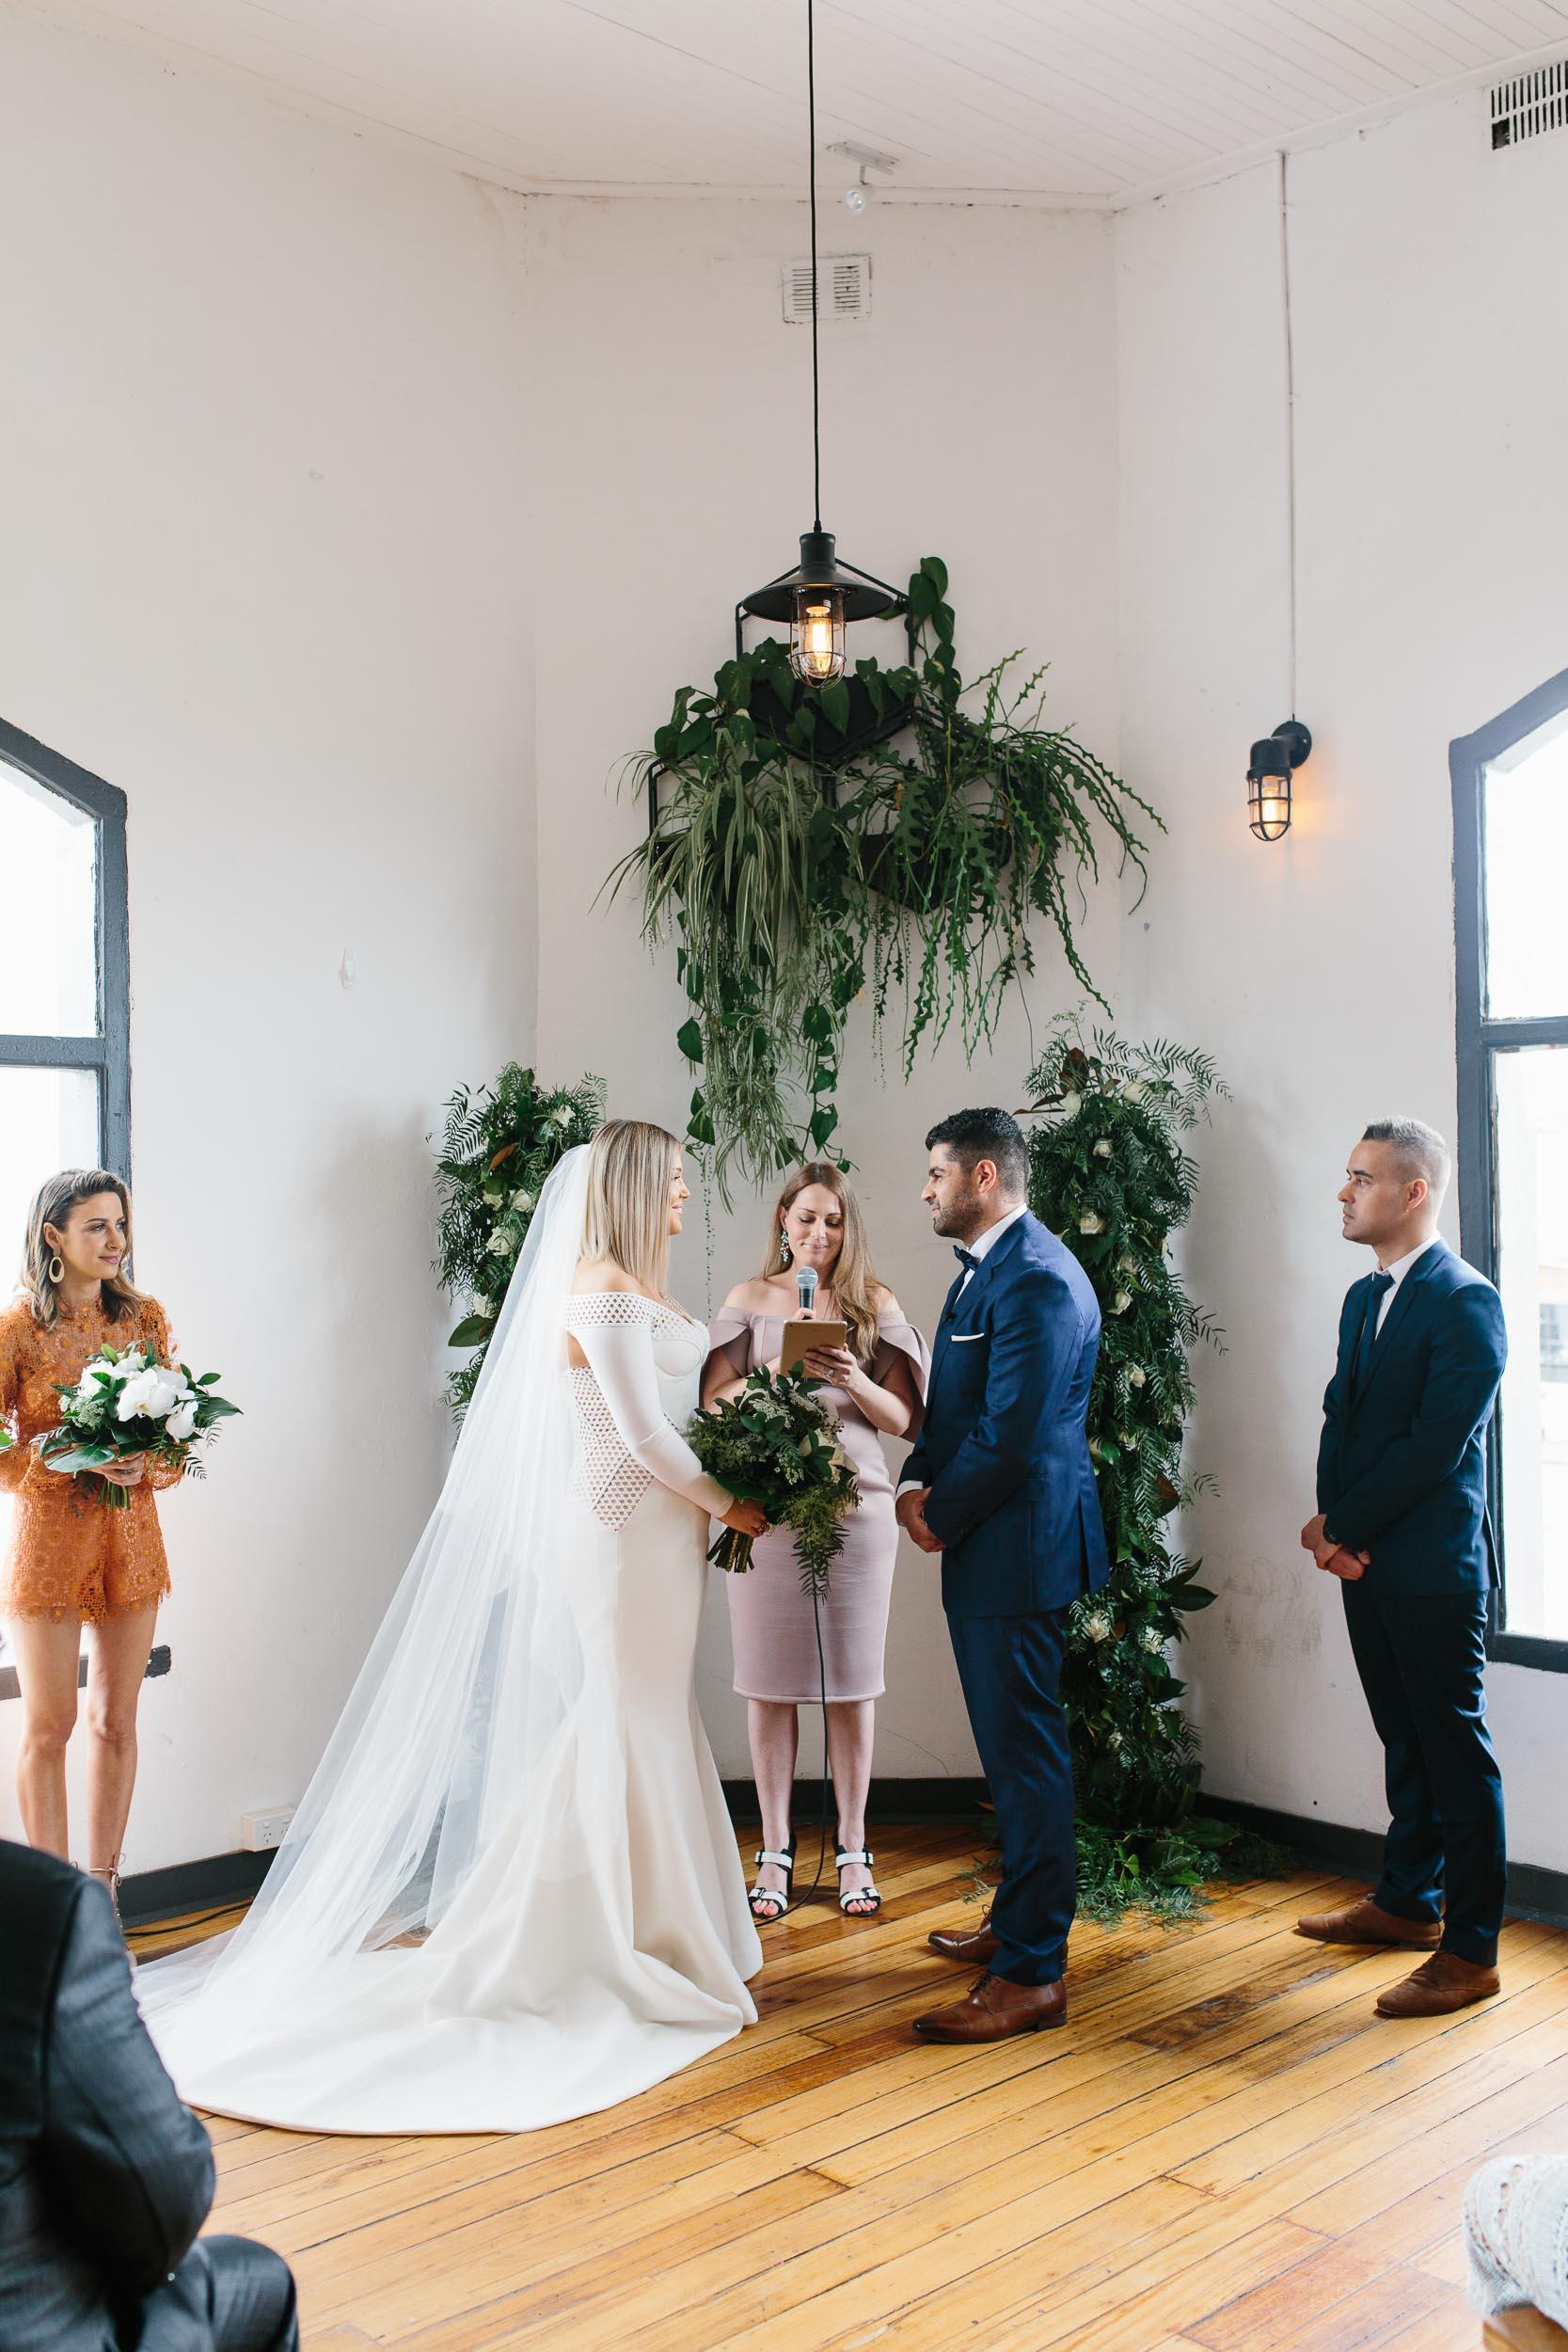 Kas-Richards-Urban-Melbourne-Wedding-Jason-Grech-271.jpg